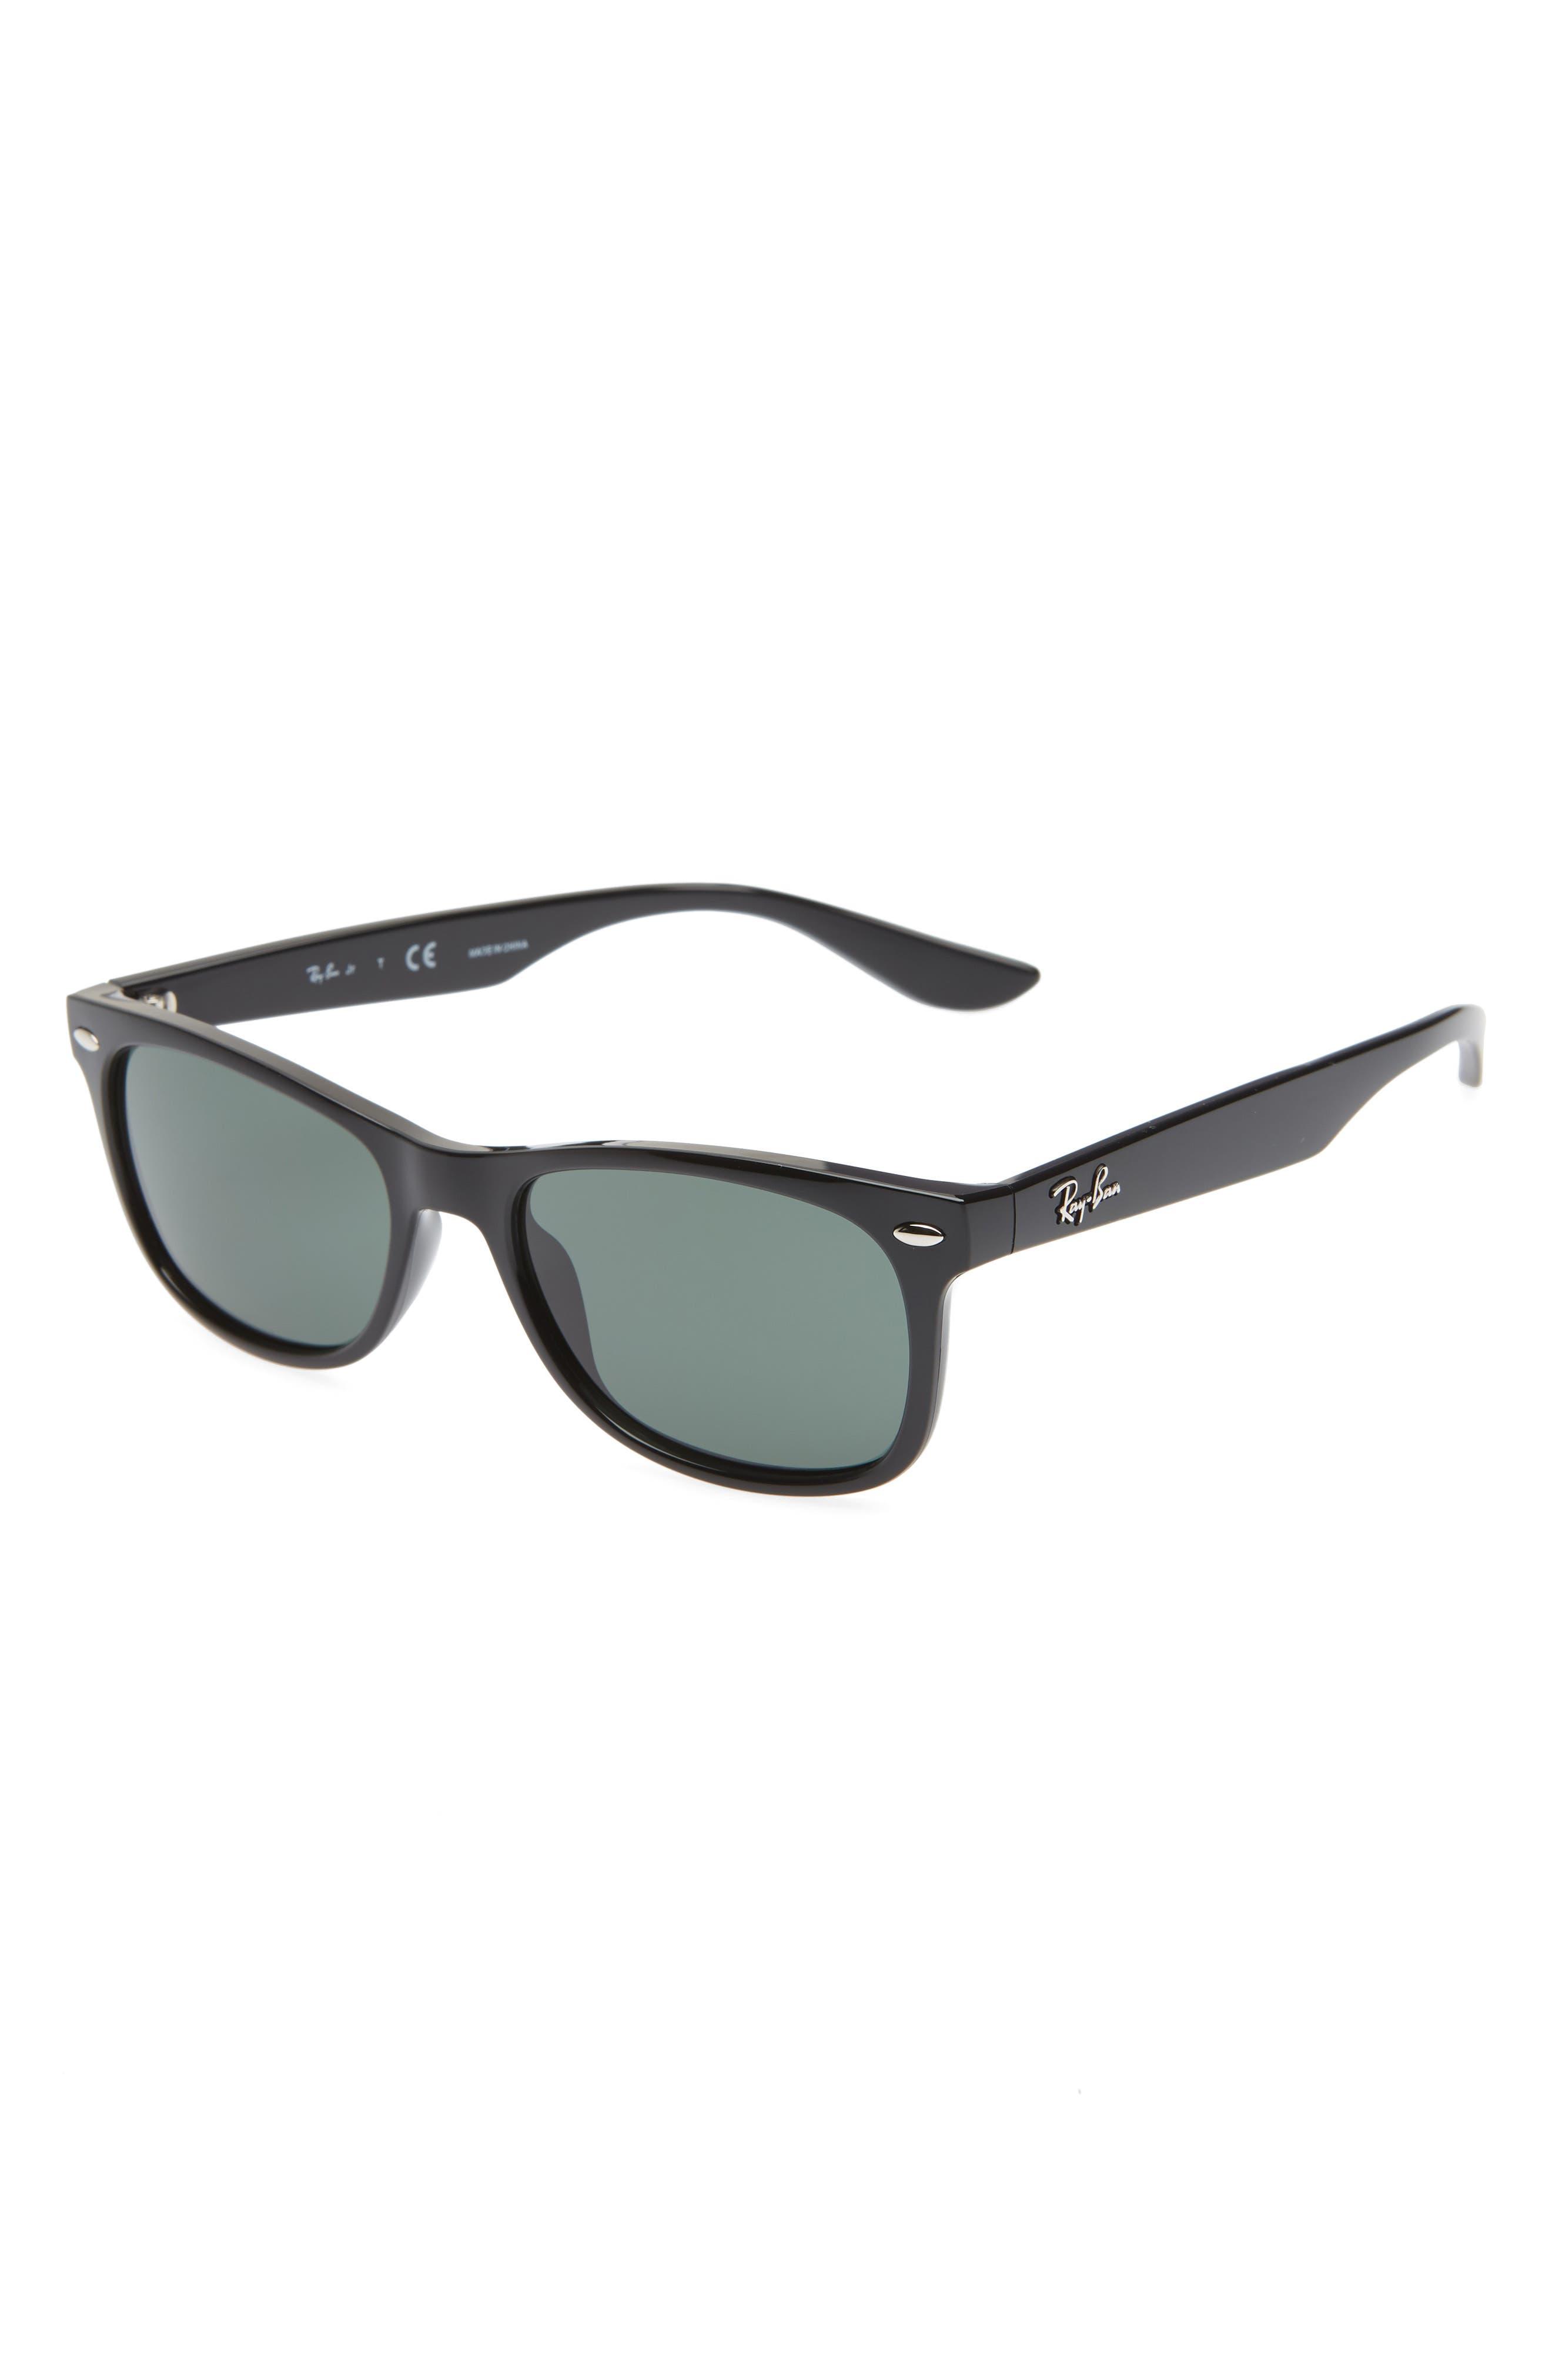 Ray-Ban Junior 4m Wayfarer Sunglasses -